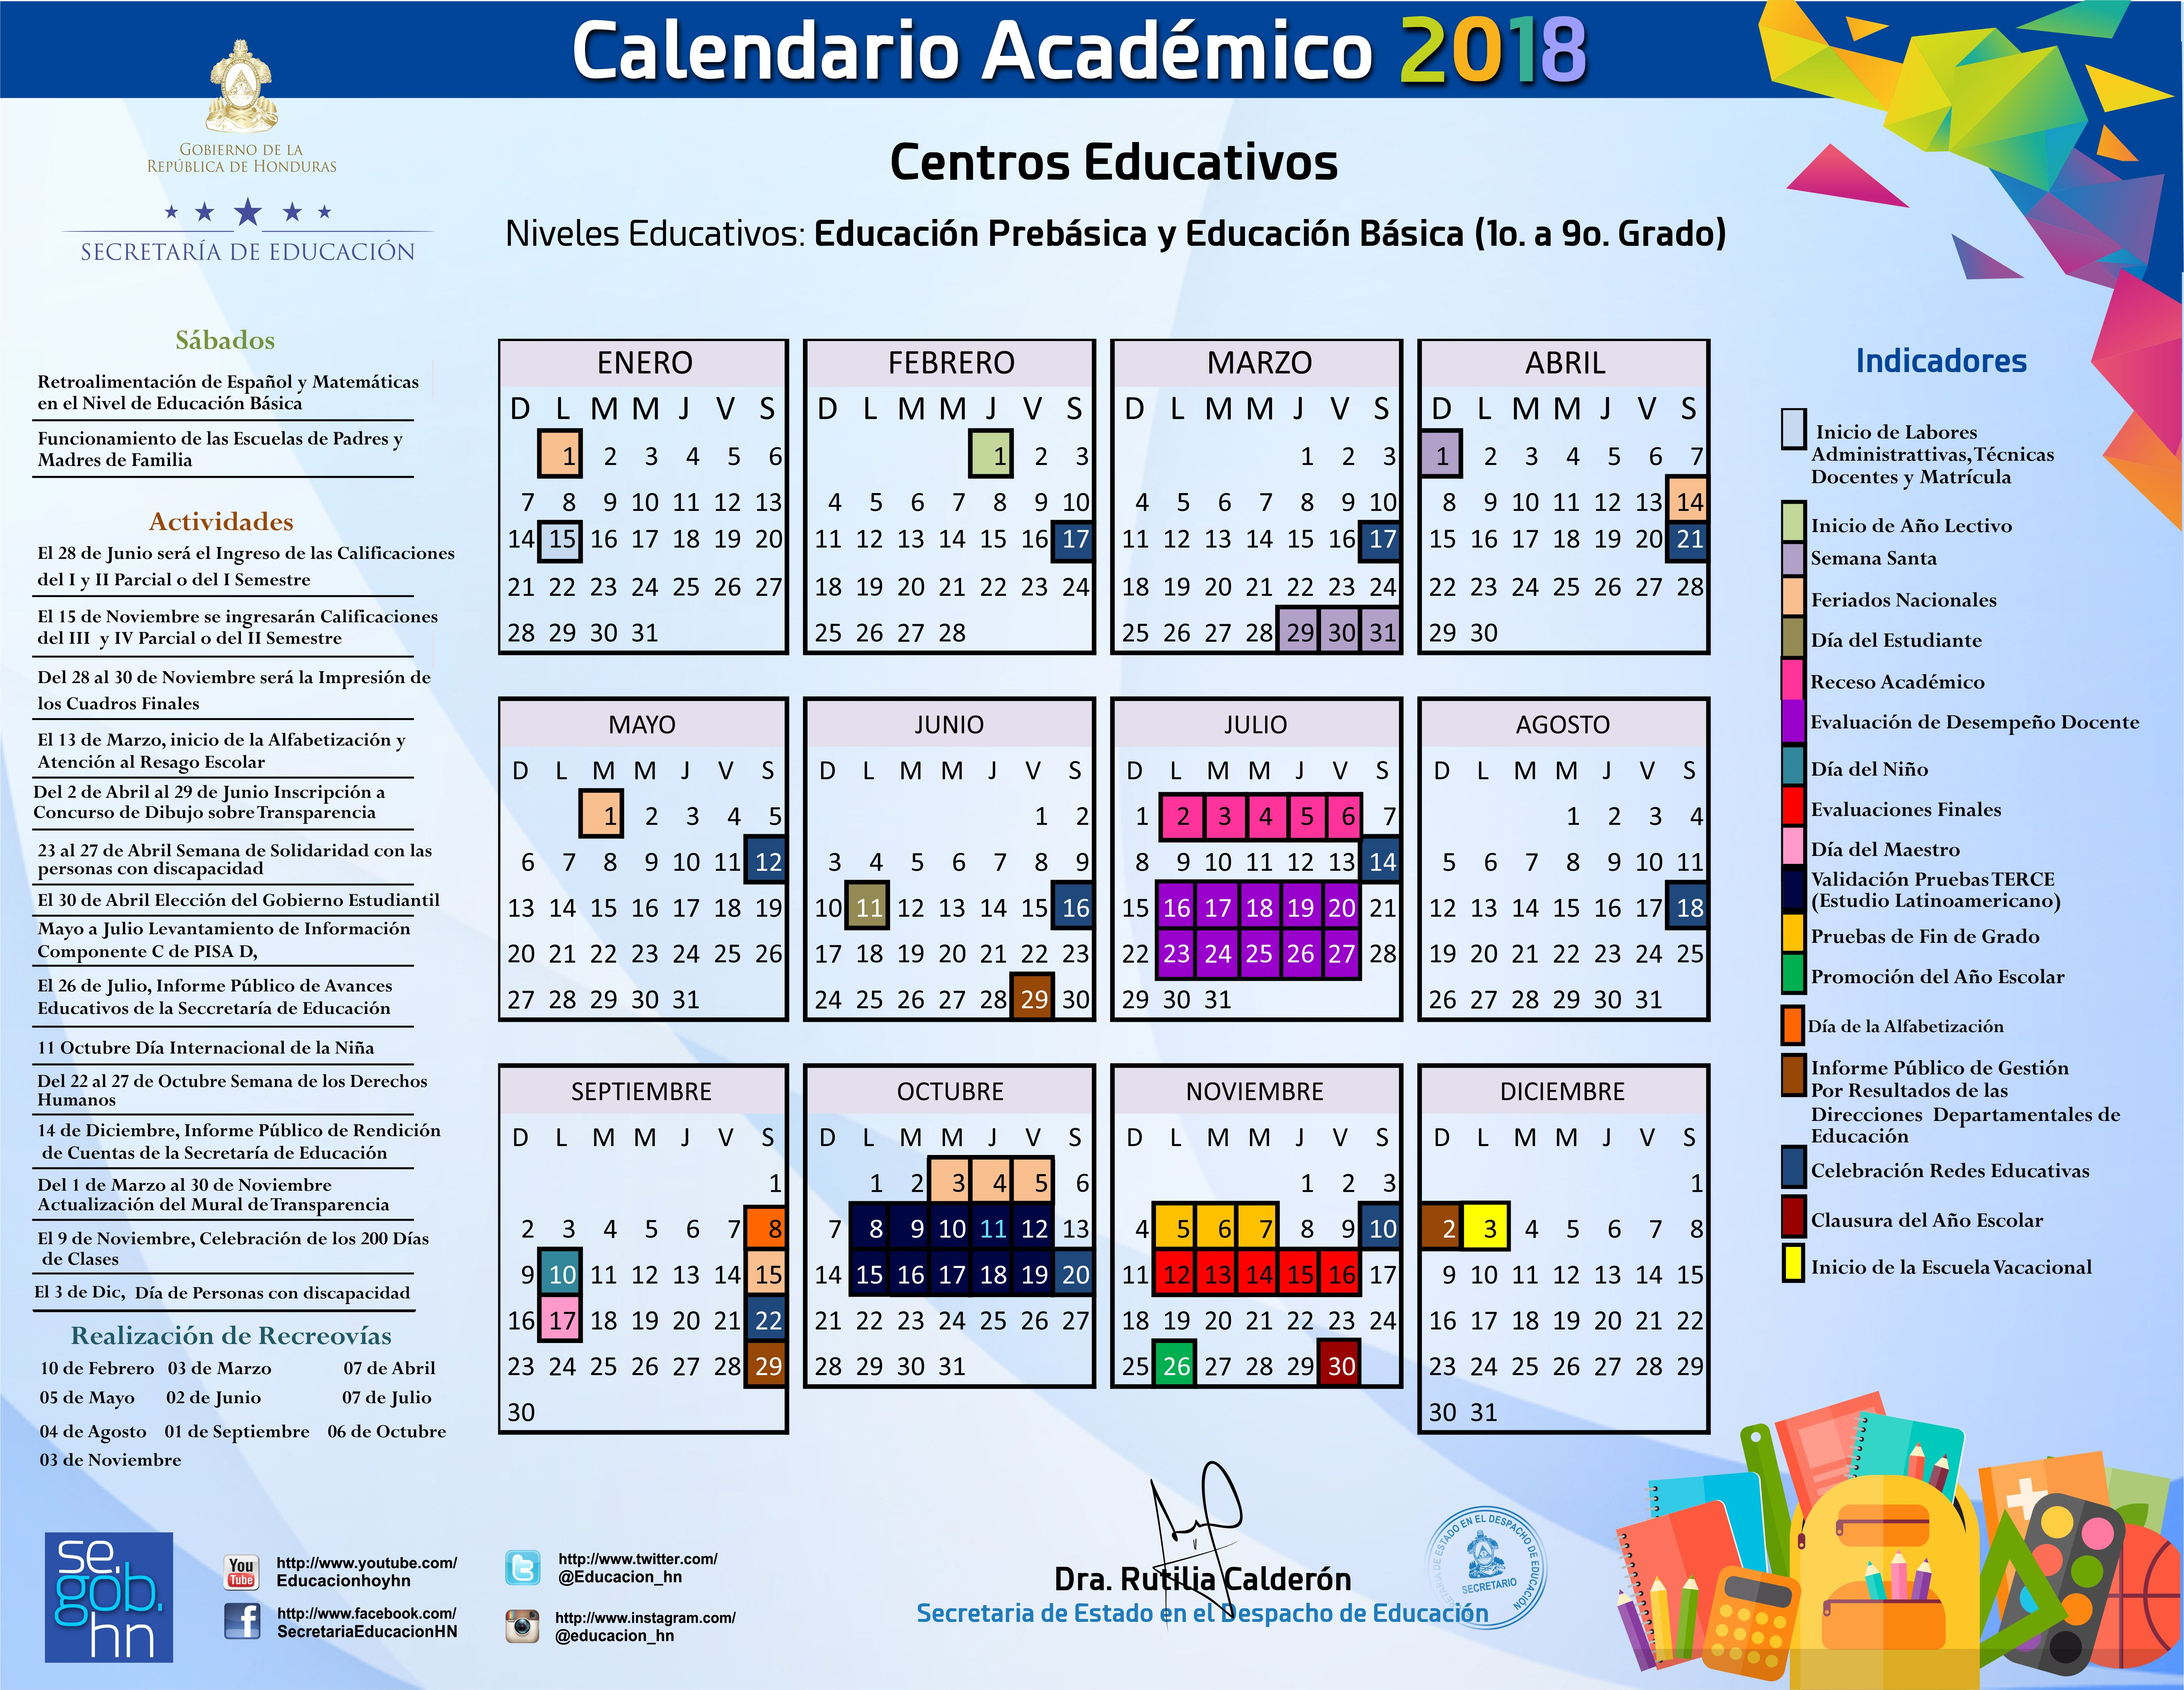 Calendario 2019 Chile Imprimir Pdf Más Caliente Calendario Mural 2018 18 Meses Nuevas Calendario Con Dias Of Calendario 2019 Chile Imprimir Pdf Más Actual 2020 2021 Calendar Printable Template